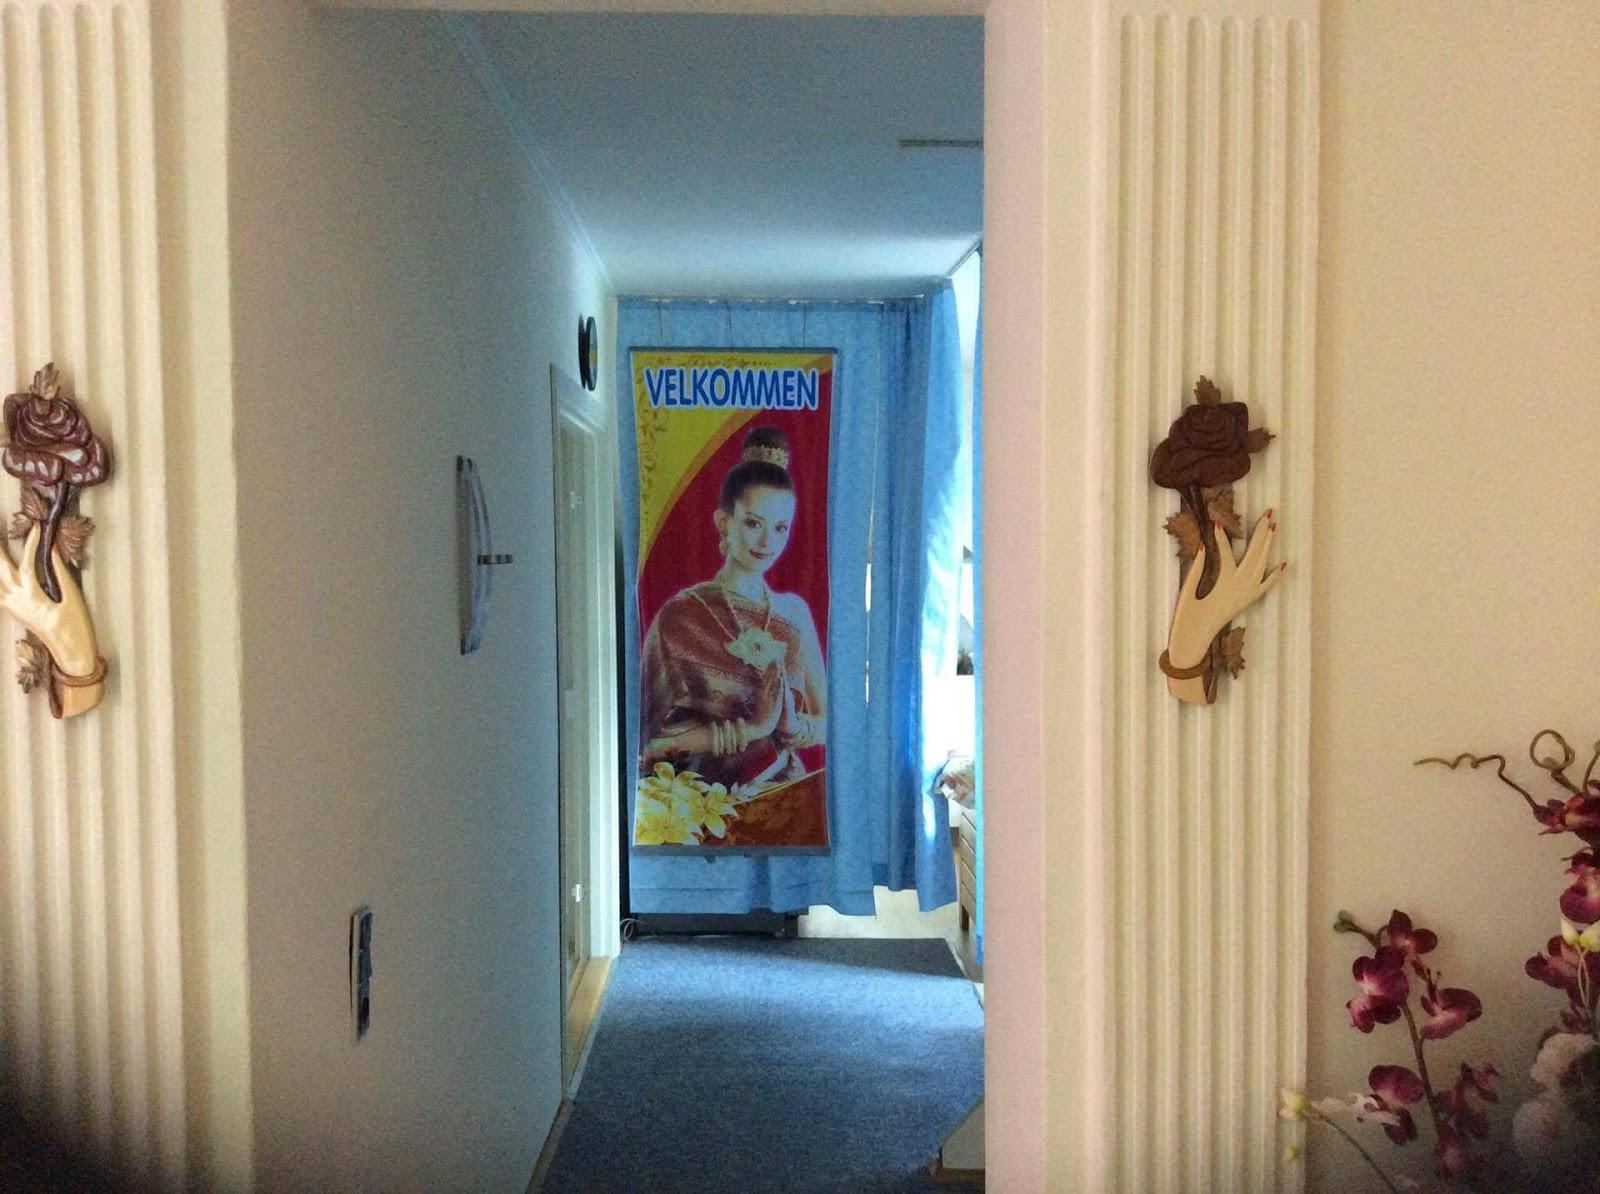 thai massage koldingvej vejle thai massage i vejle